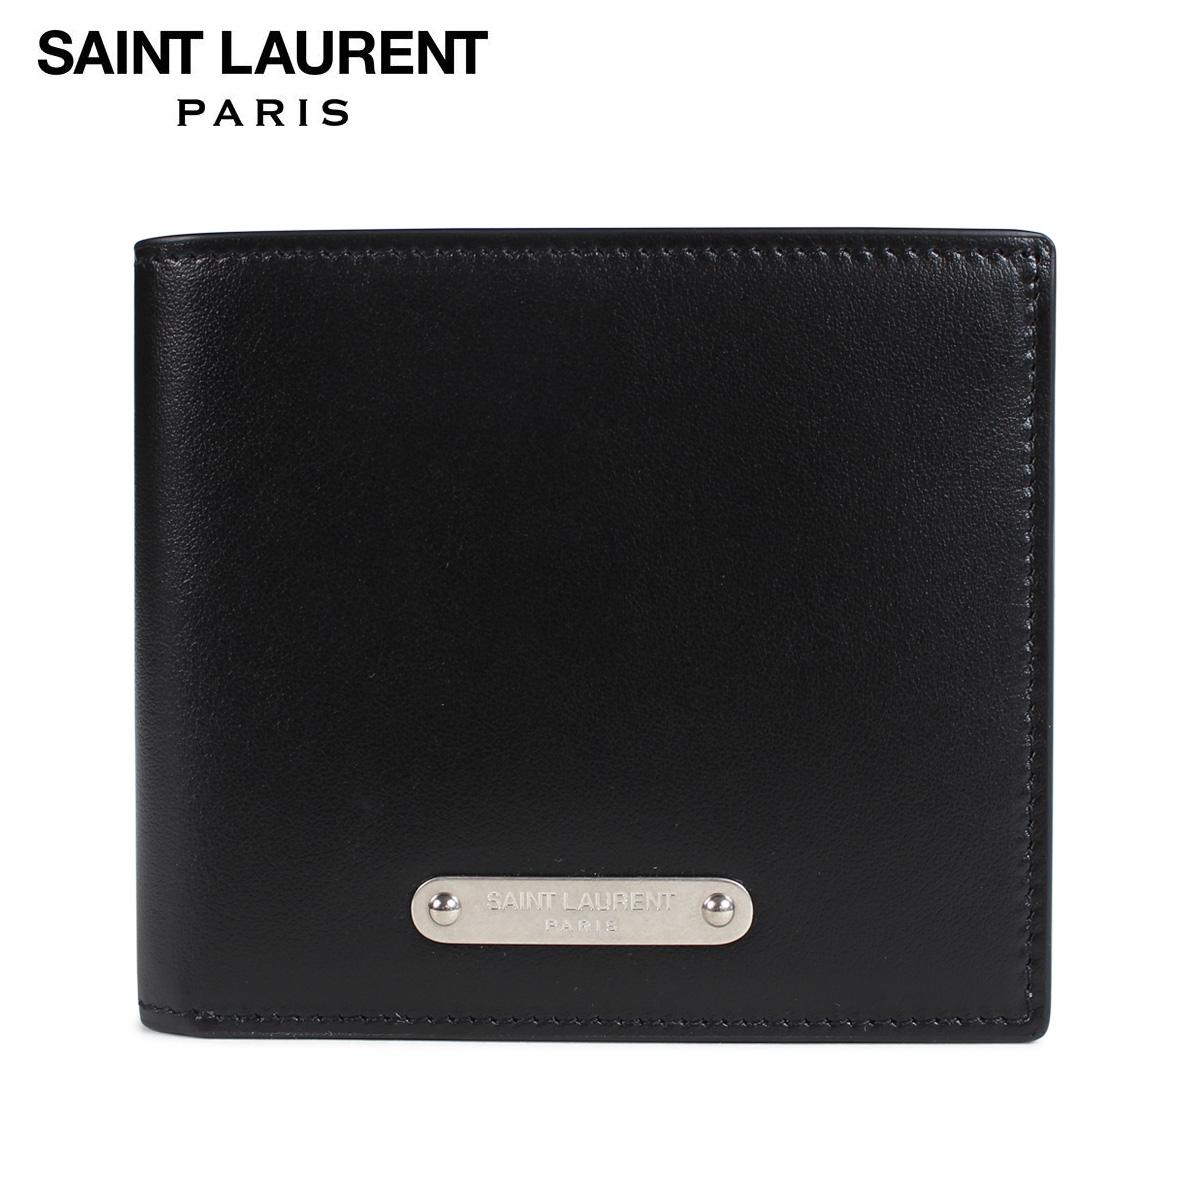 SAINT LAURENT PARIS LEATHER WALLET サンローラン パリ 財布 二つ折り メンズ レディース ブラック 462357 DV70E